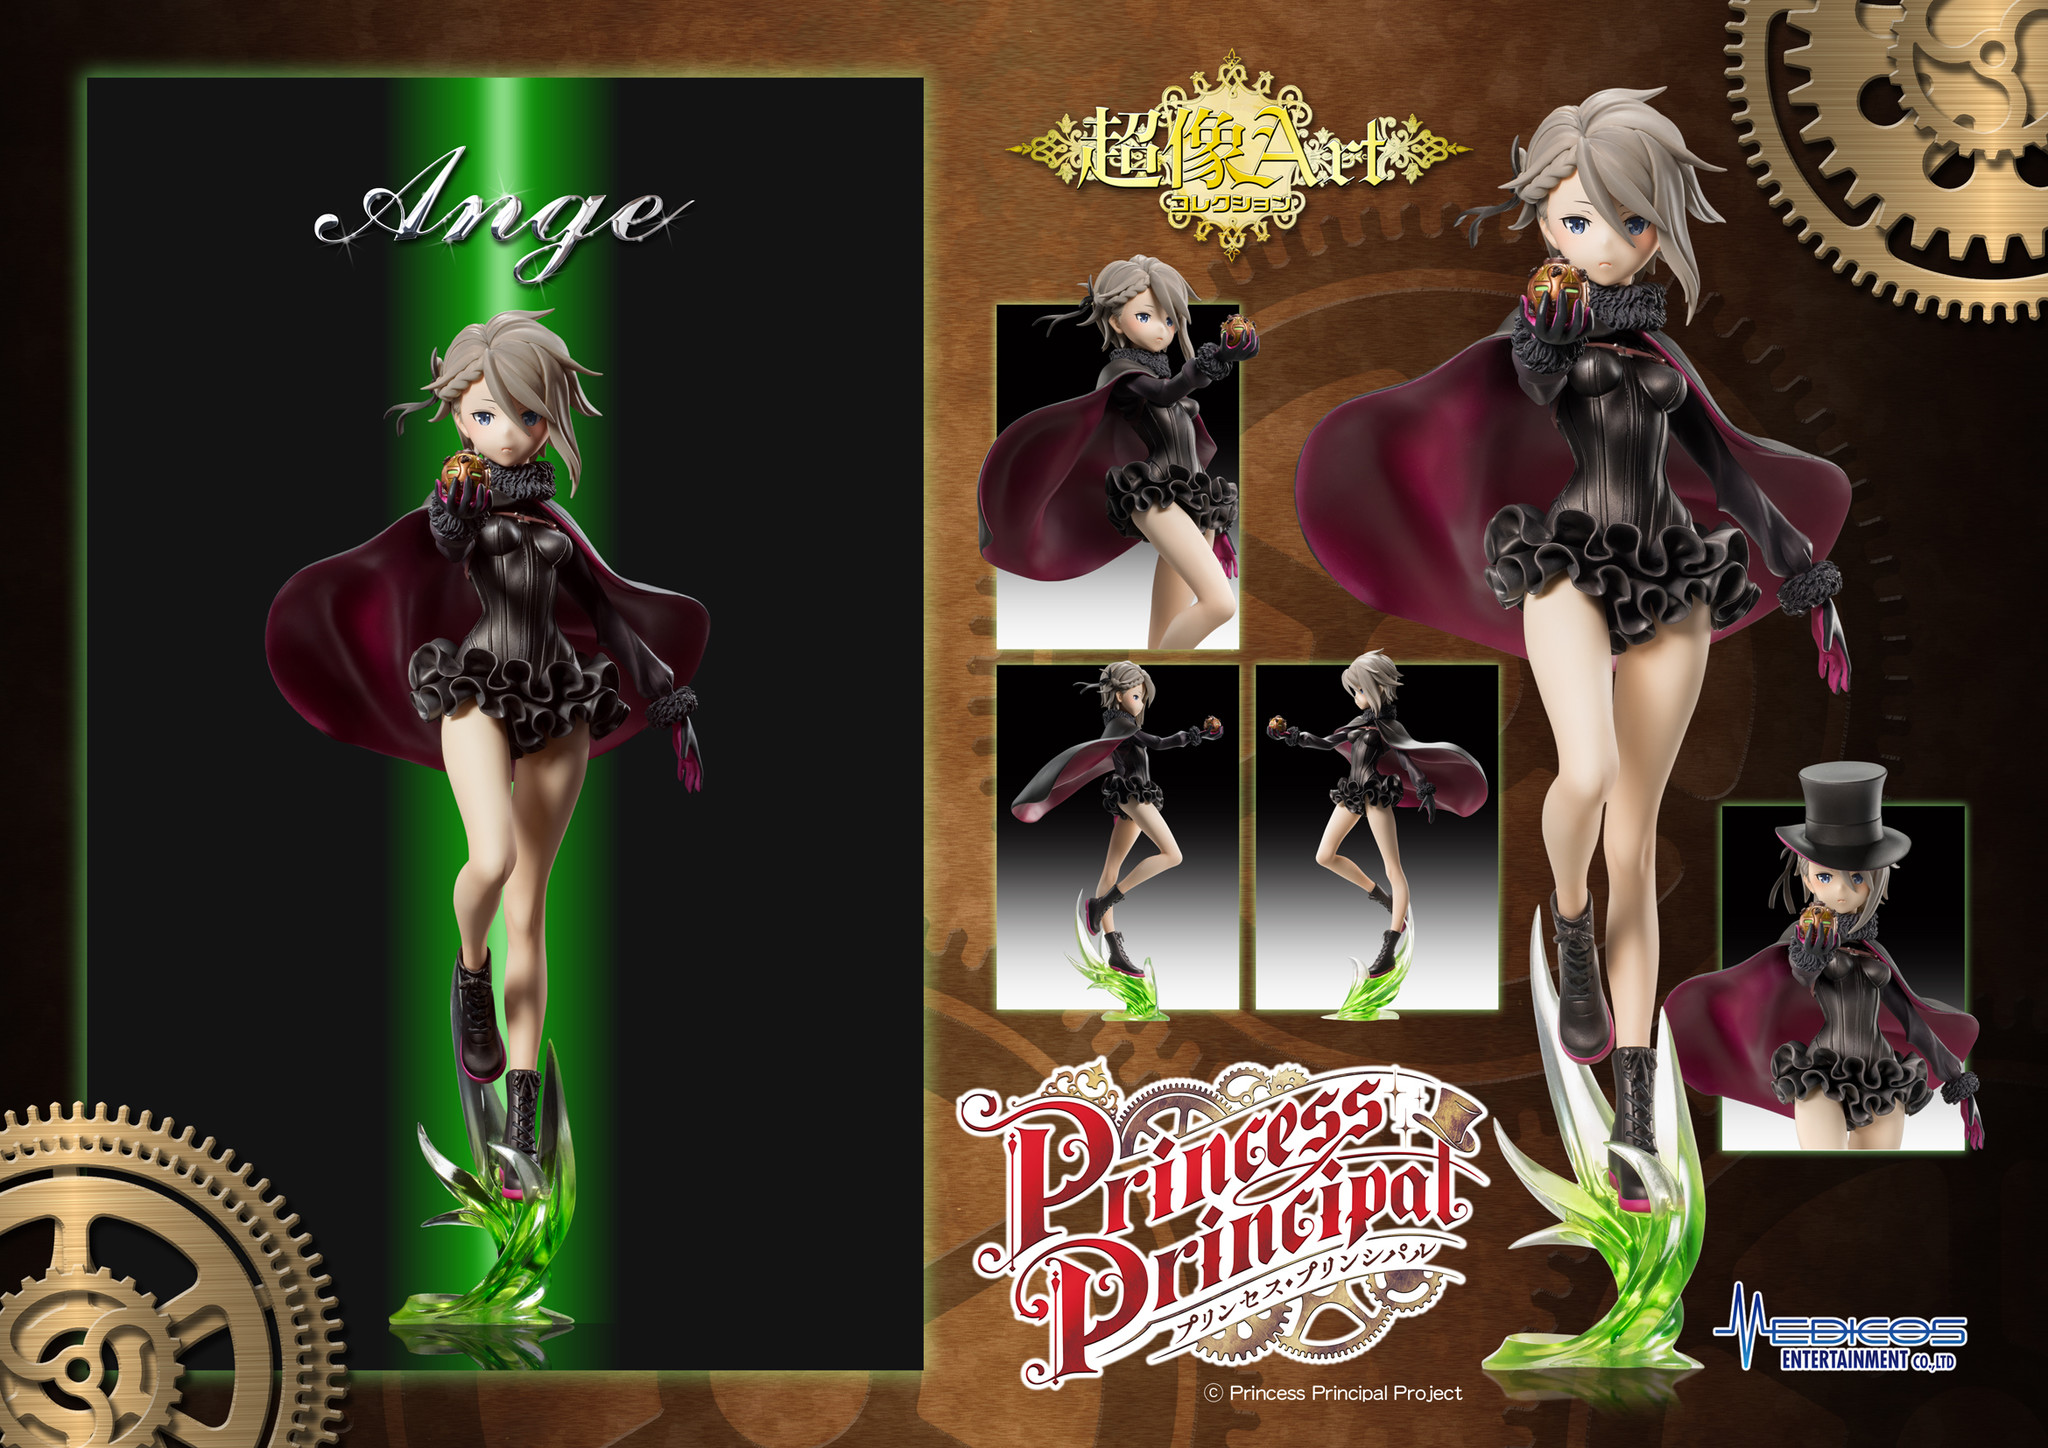 medicos_entertainment progress super_figure_art_collection ange princess_principal